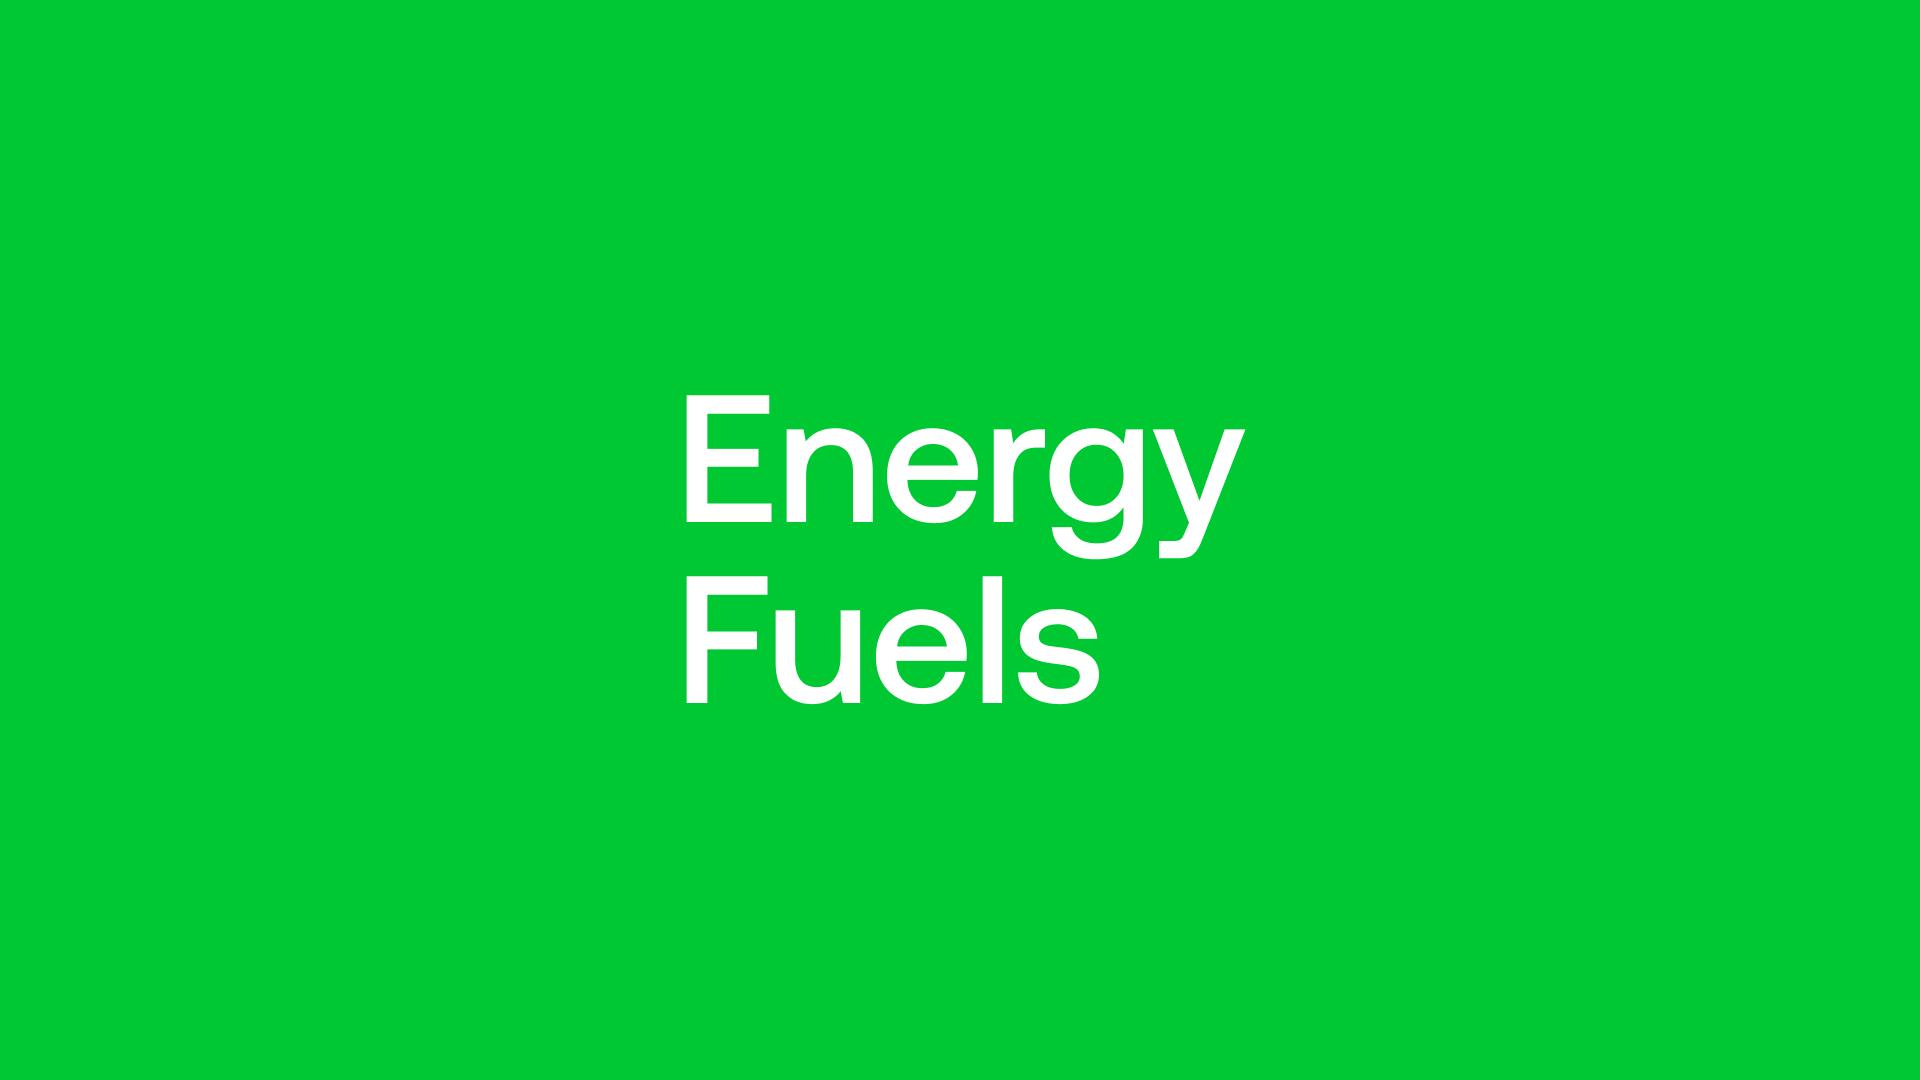 Energy Fuels (UUUU) - USA Critical Minerals Hub Getting Love